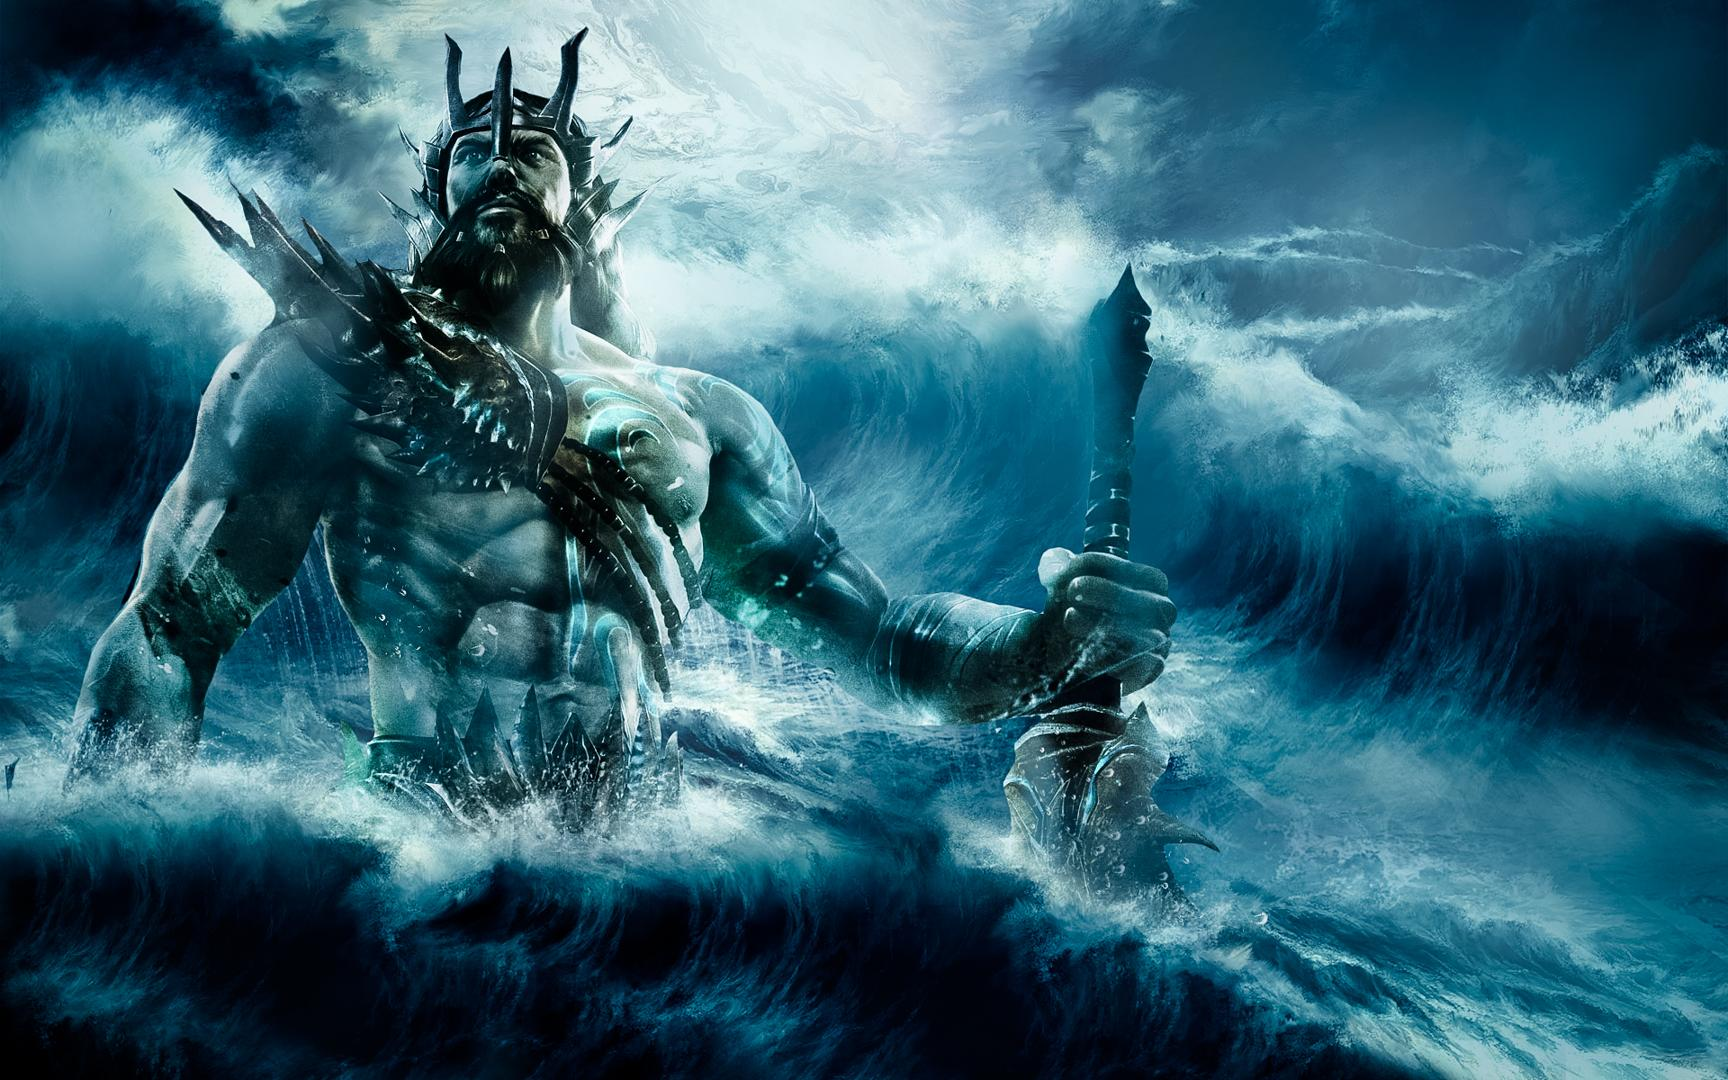 Ancient Gods Hd Wallpaper Poseidon God Of The Sea